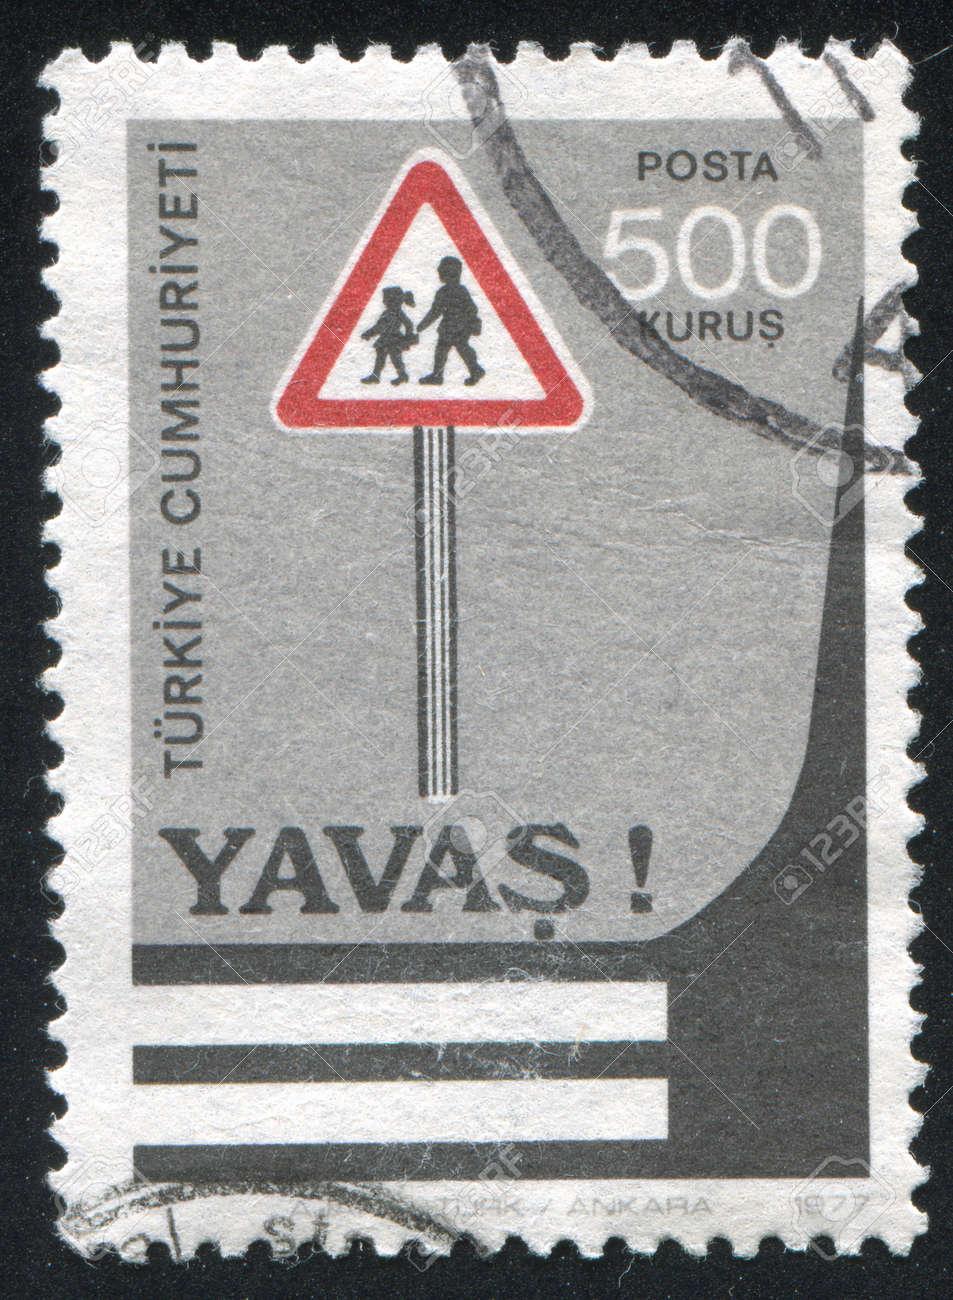 TURKEY - CIRCA 1977: stamp printed by Turkey, shows road safety, pedestrian crossing,  circa 1977 Stock Photo - 12999359